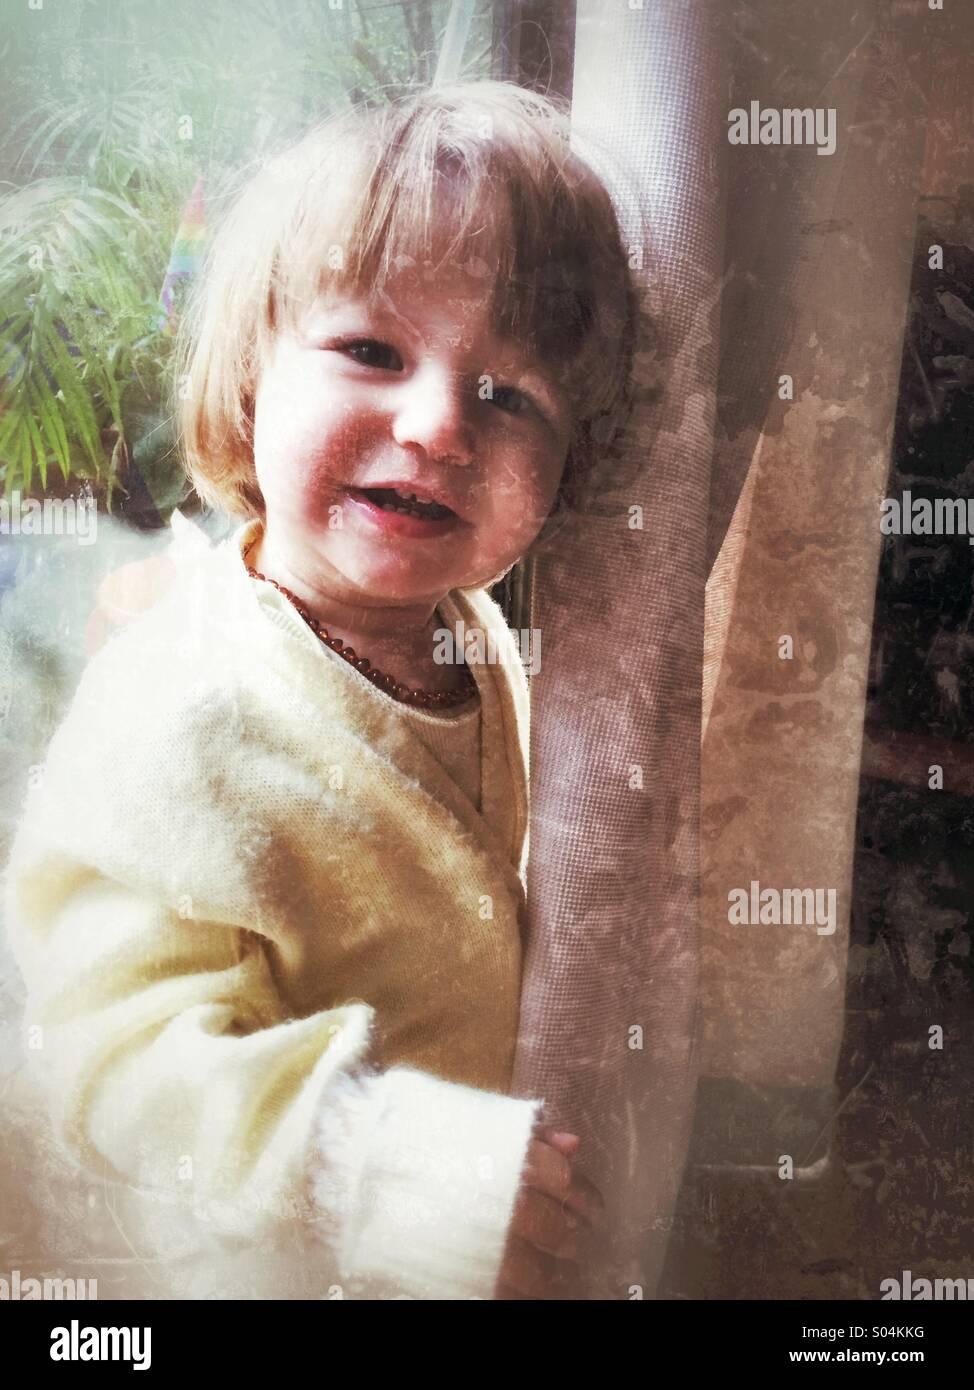 Toddler girl looking at camera happy - Stock Image